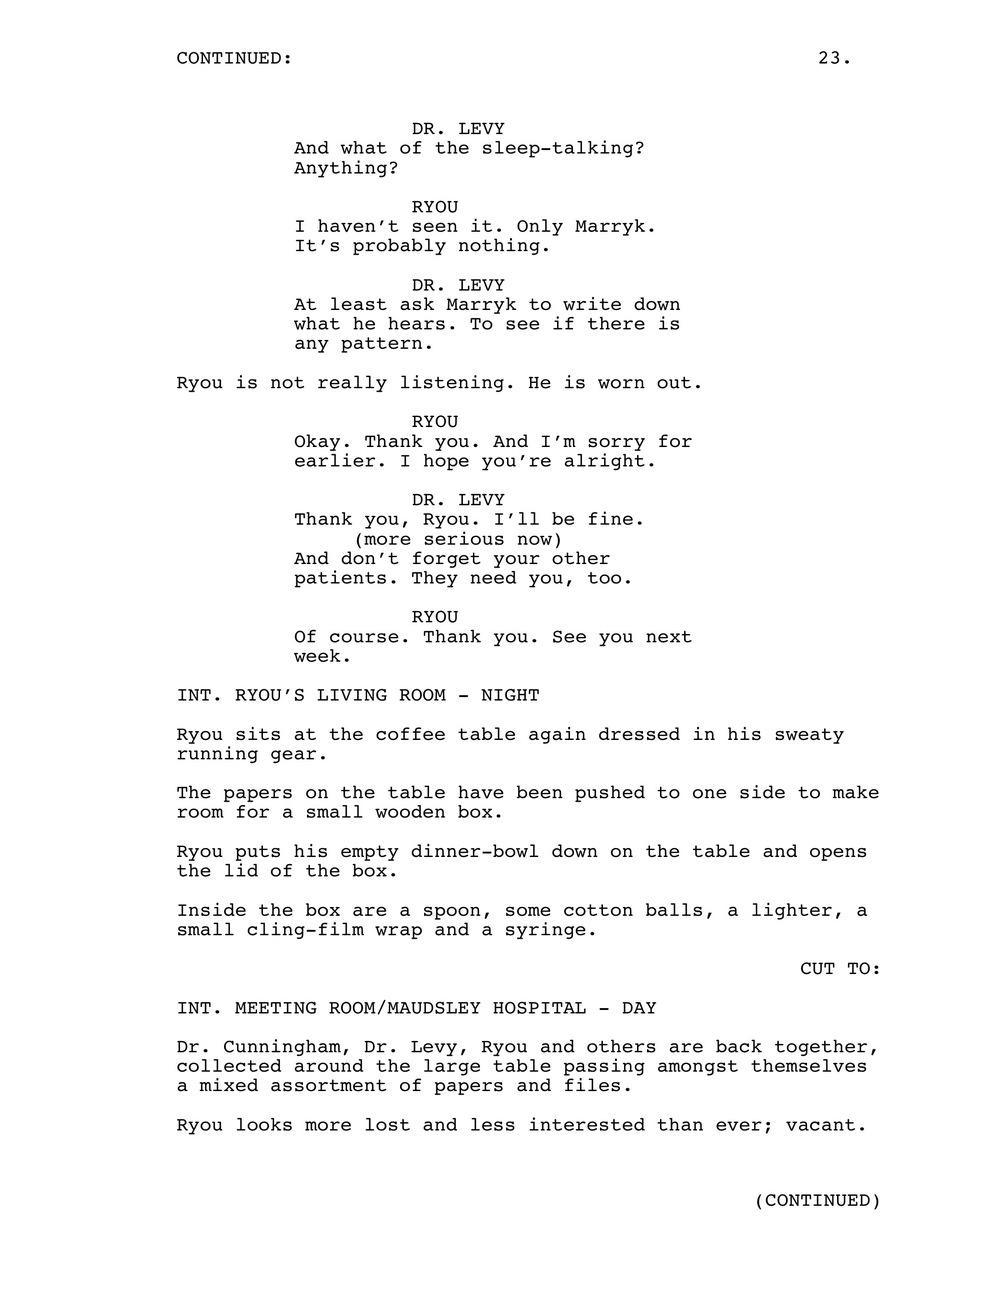 'Introducing Henry Charles' (Pilot) by Alexander Craig | 23.jpeg